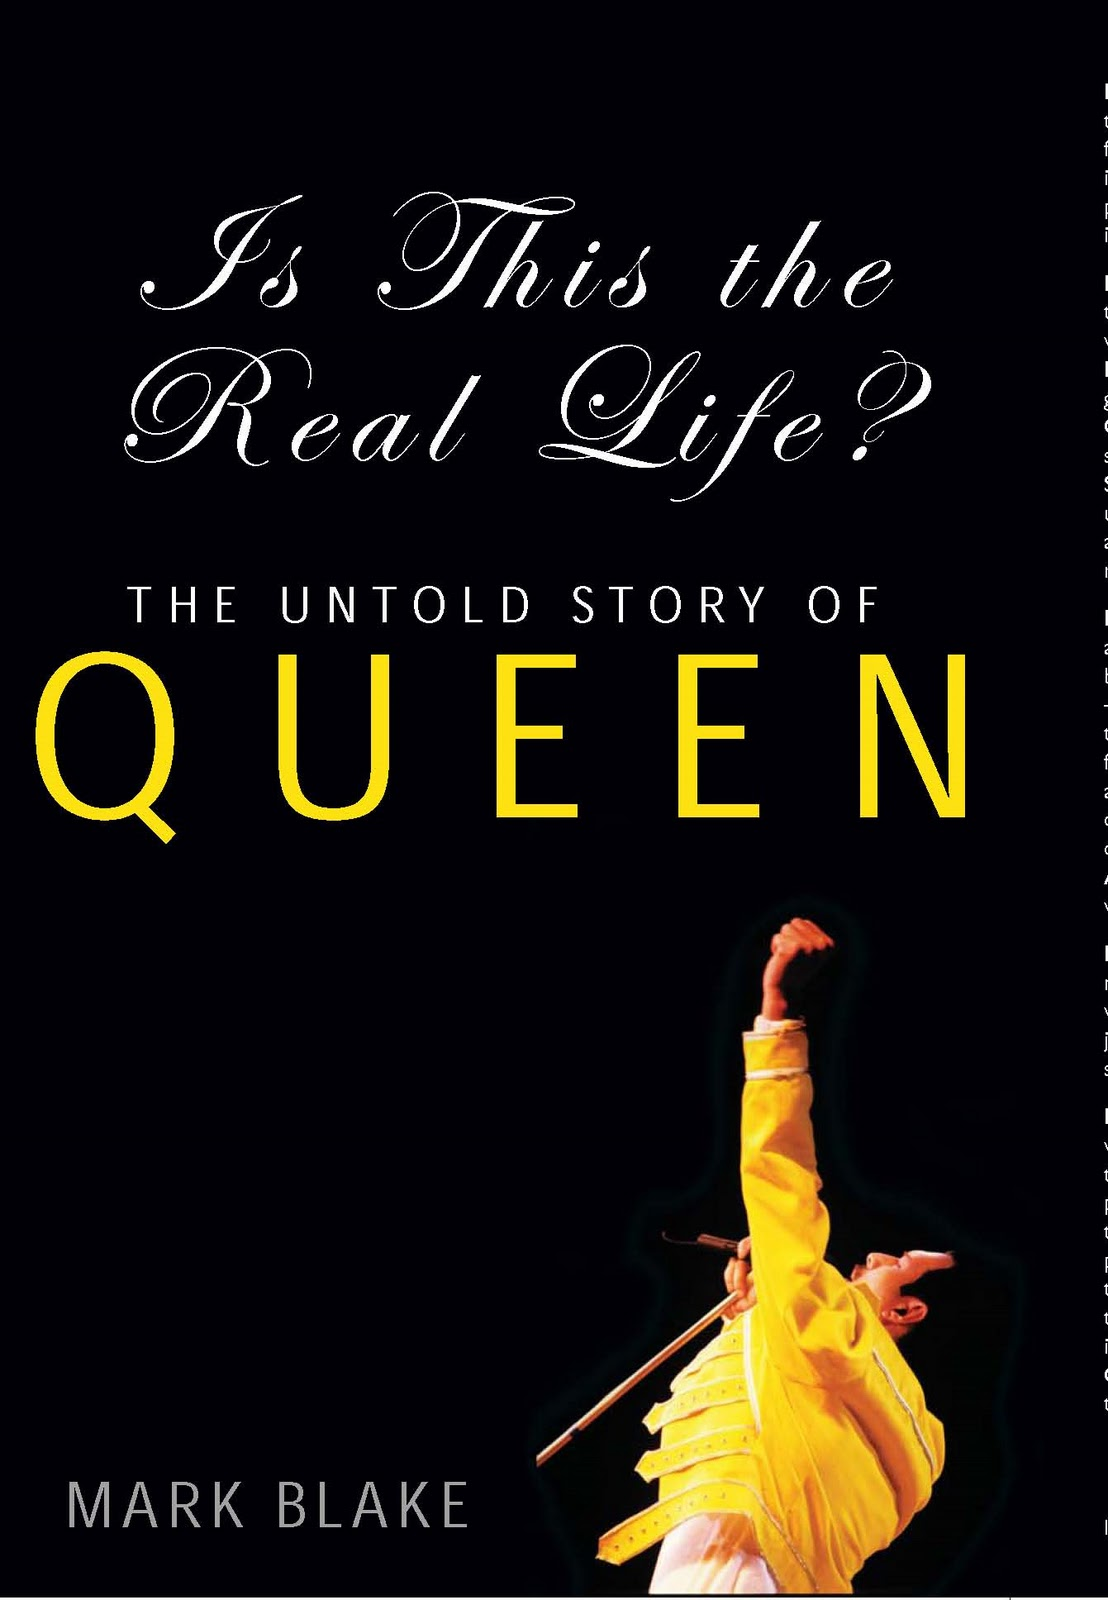 http://2.bp.blogspot.com/_NdssK-xlQPI/TKy54W8c8iI/AAAAAAAAHXU/fmikqQ07DB8/s1600/queen+book+cover.jpg